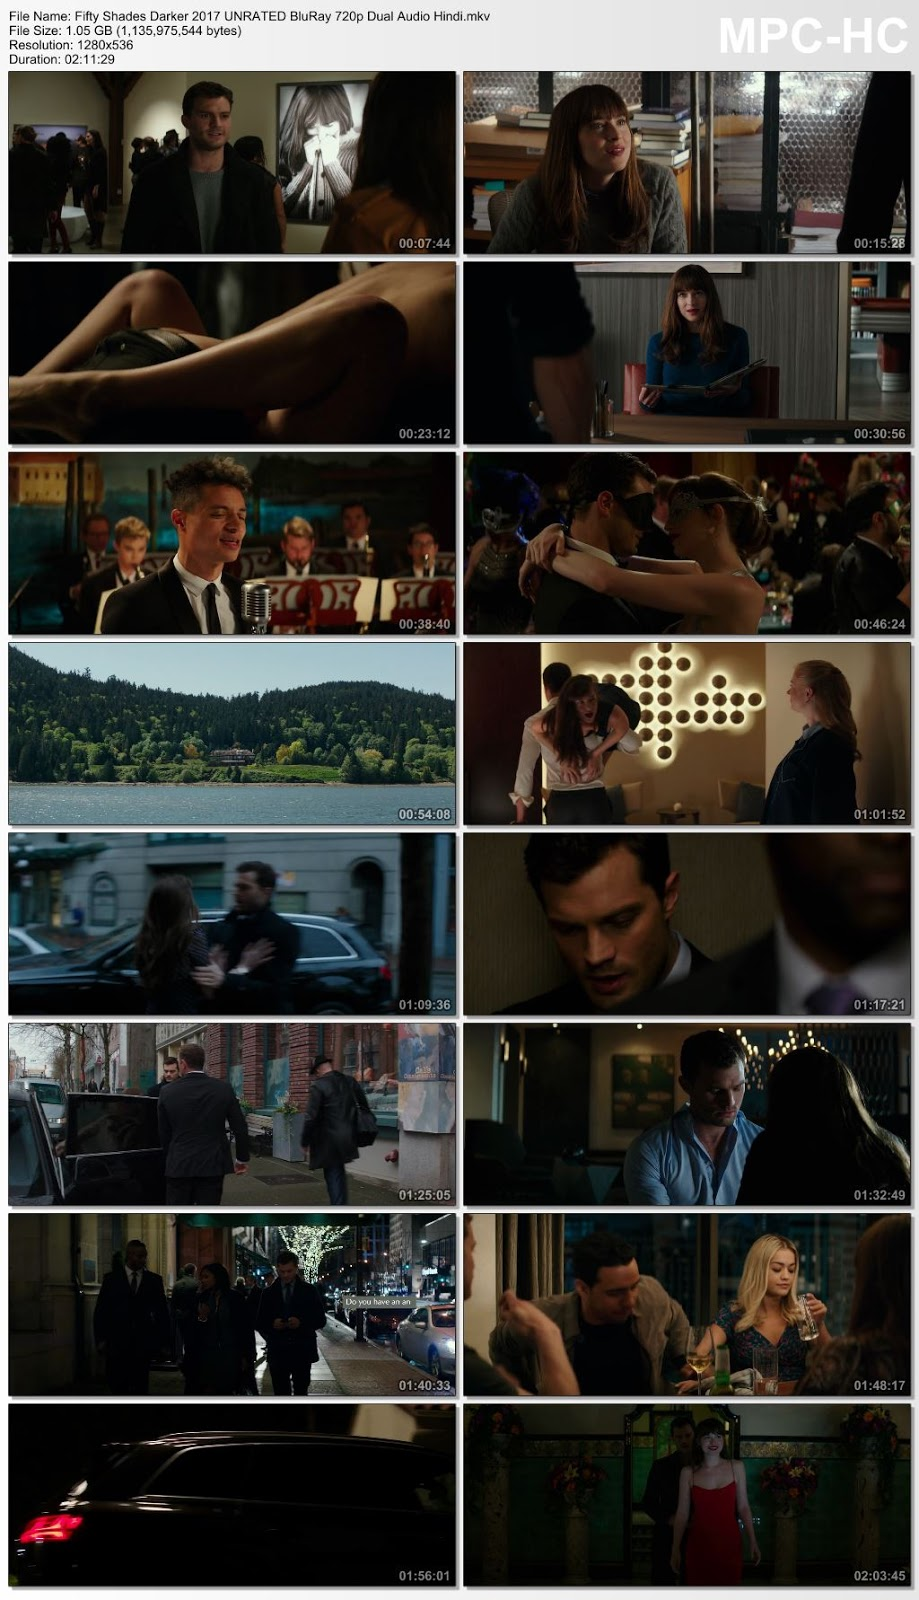 Fifty Shades Darker (2017) UNRATED 720p BluRay Dual Audio [Hindi – English] 1GB Desirehub